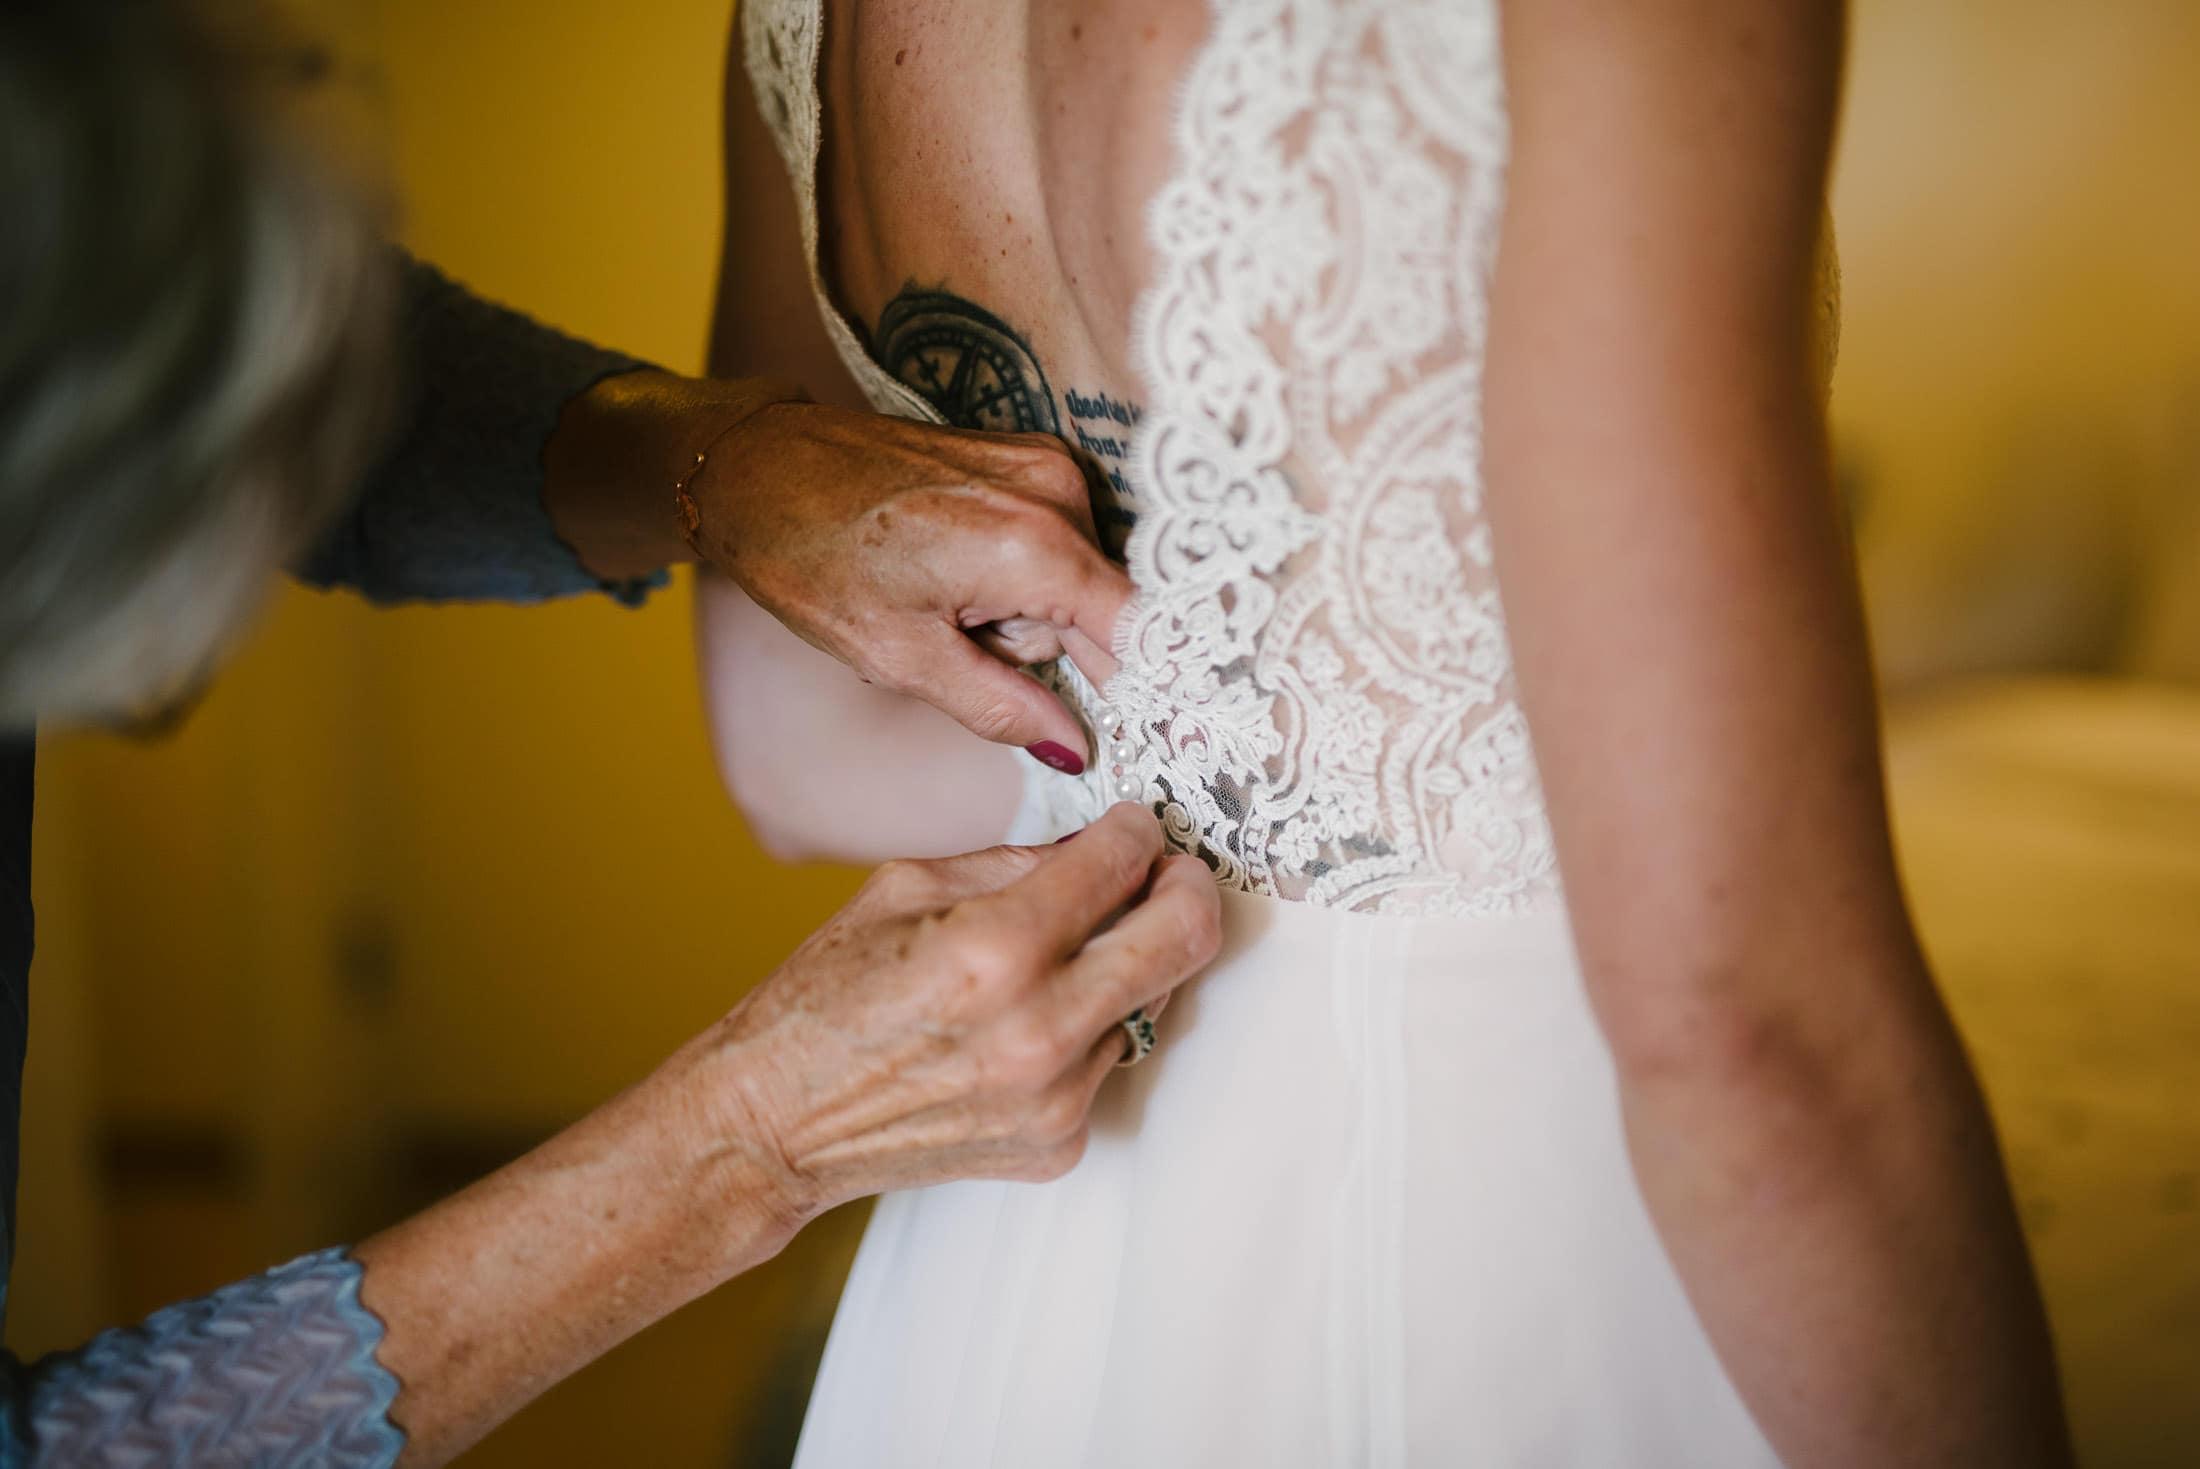 Tattoos on Bride's Back